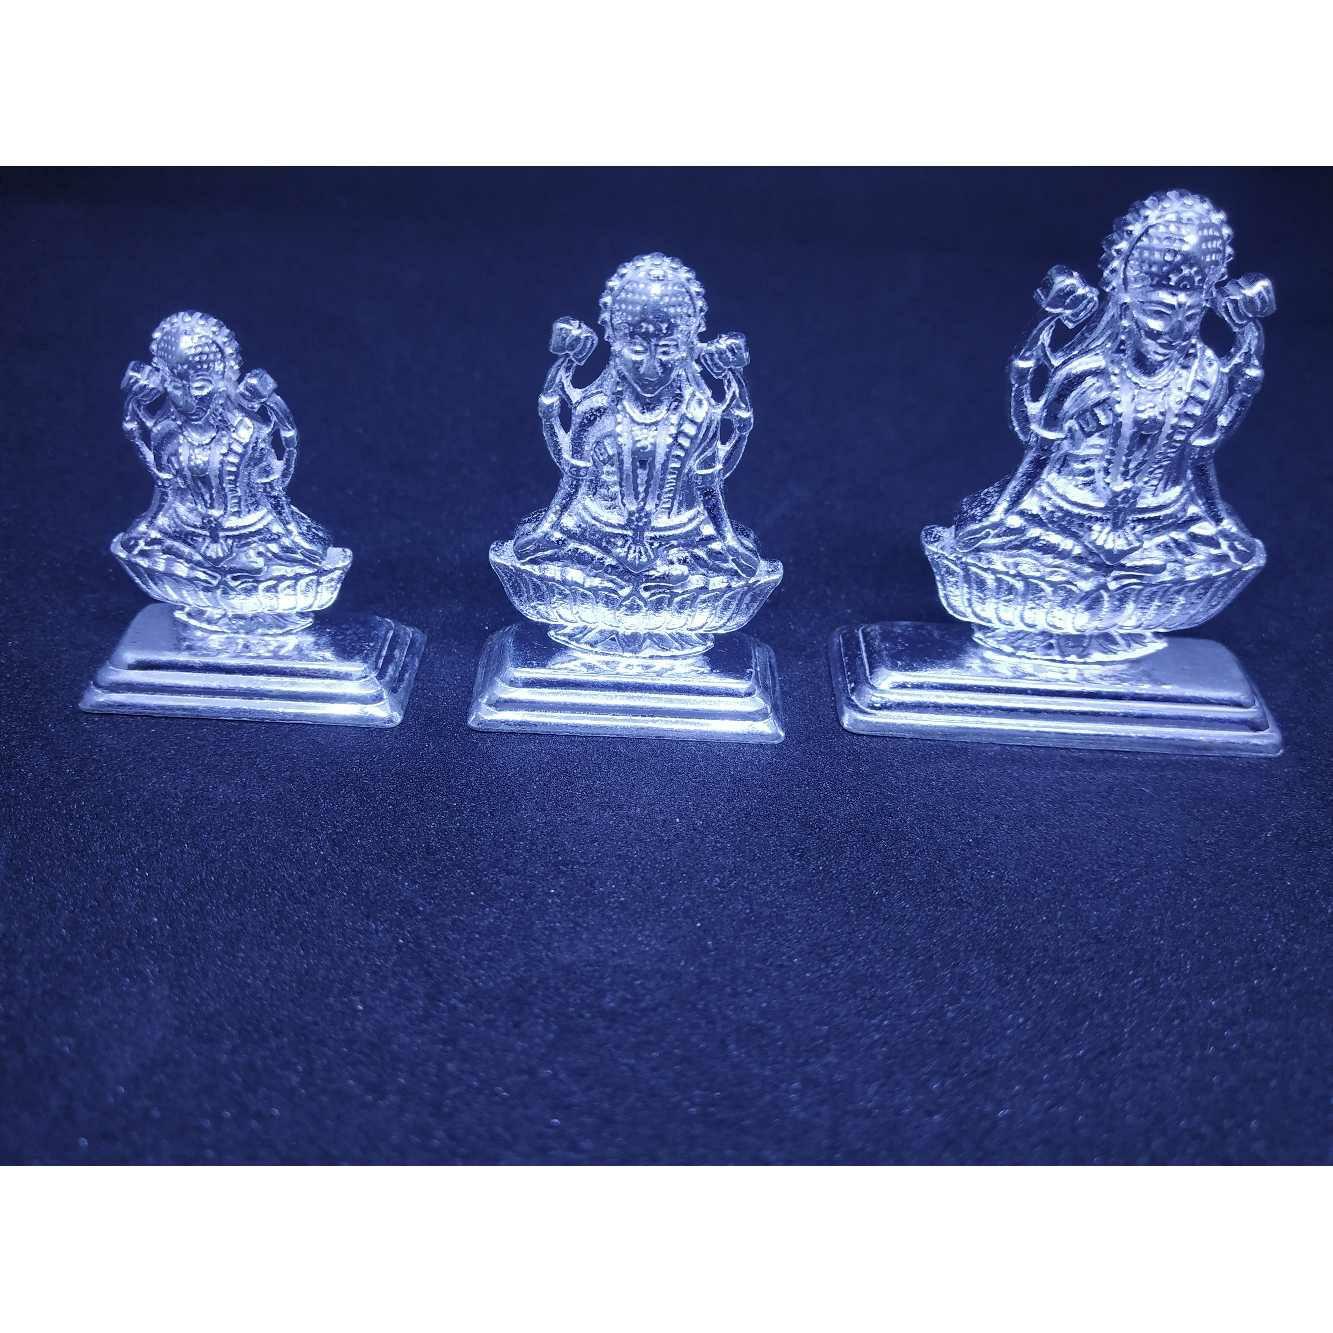 Single Laxmi Heavy-light Weight Traditional Casting Murti(Bhagvan,God)